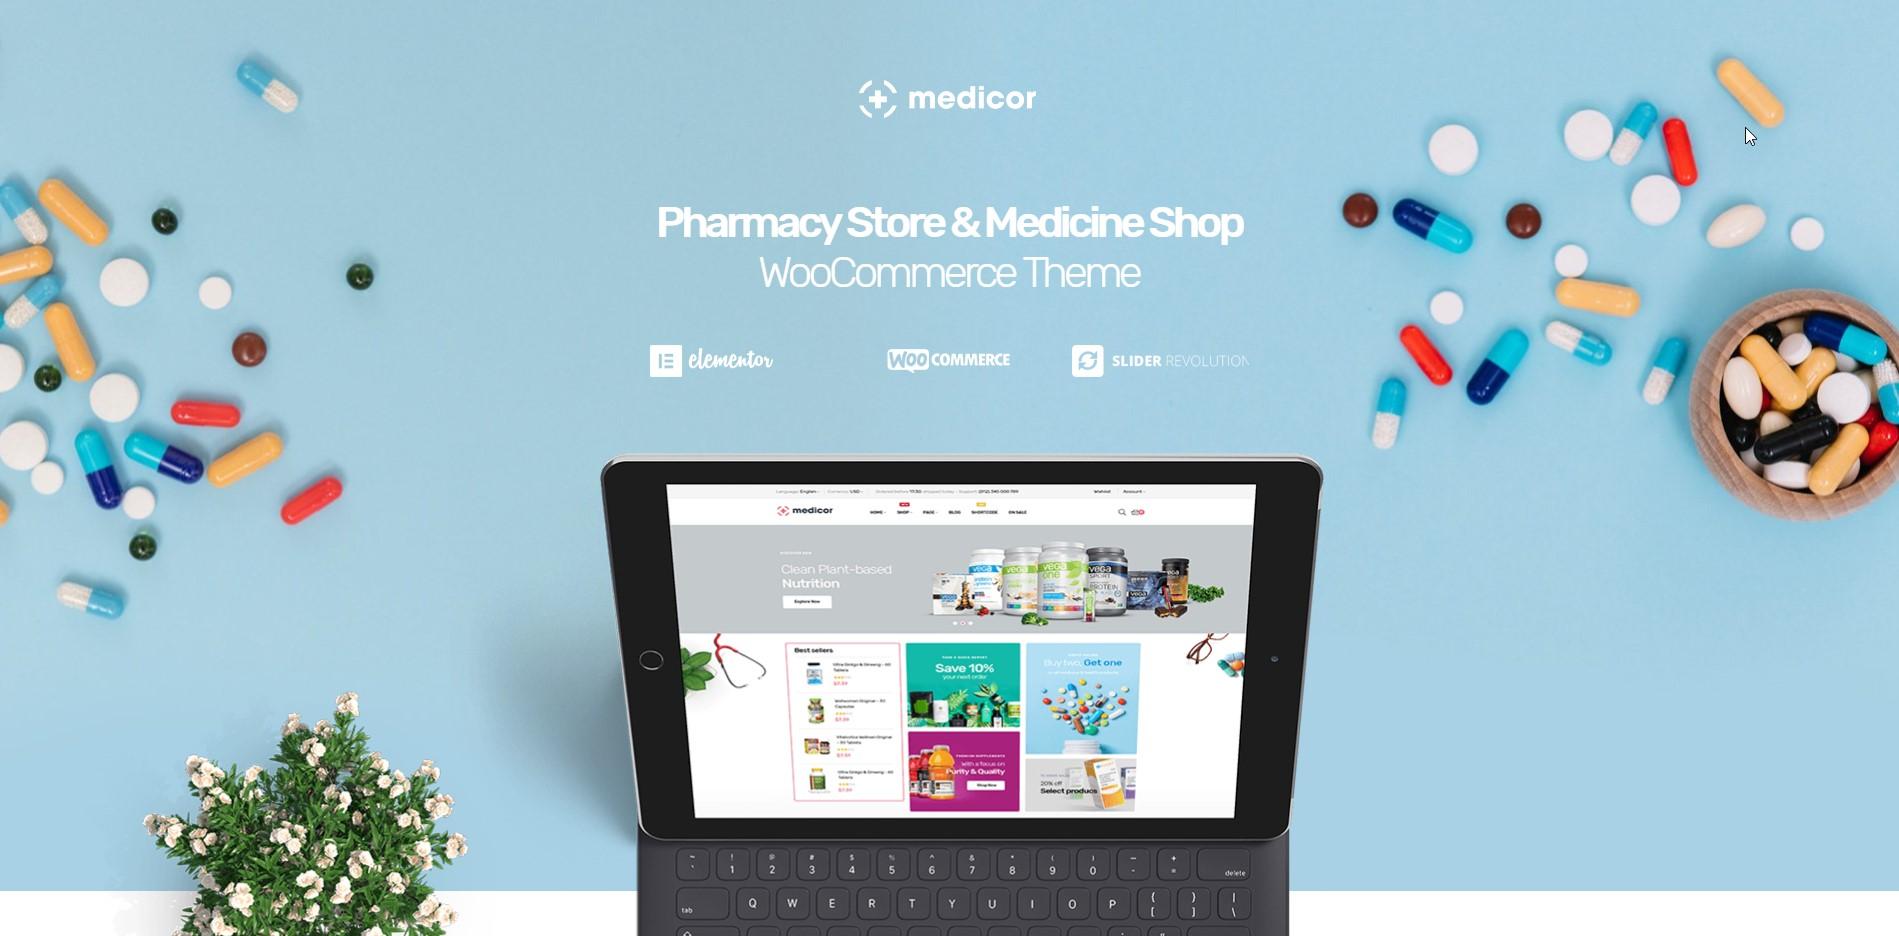 Medicor - Pharmacy & Medicine Shop WooCommerce Theme